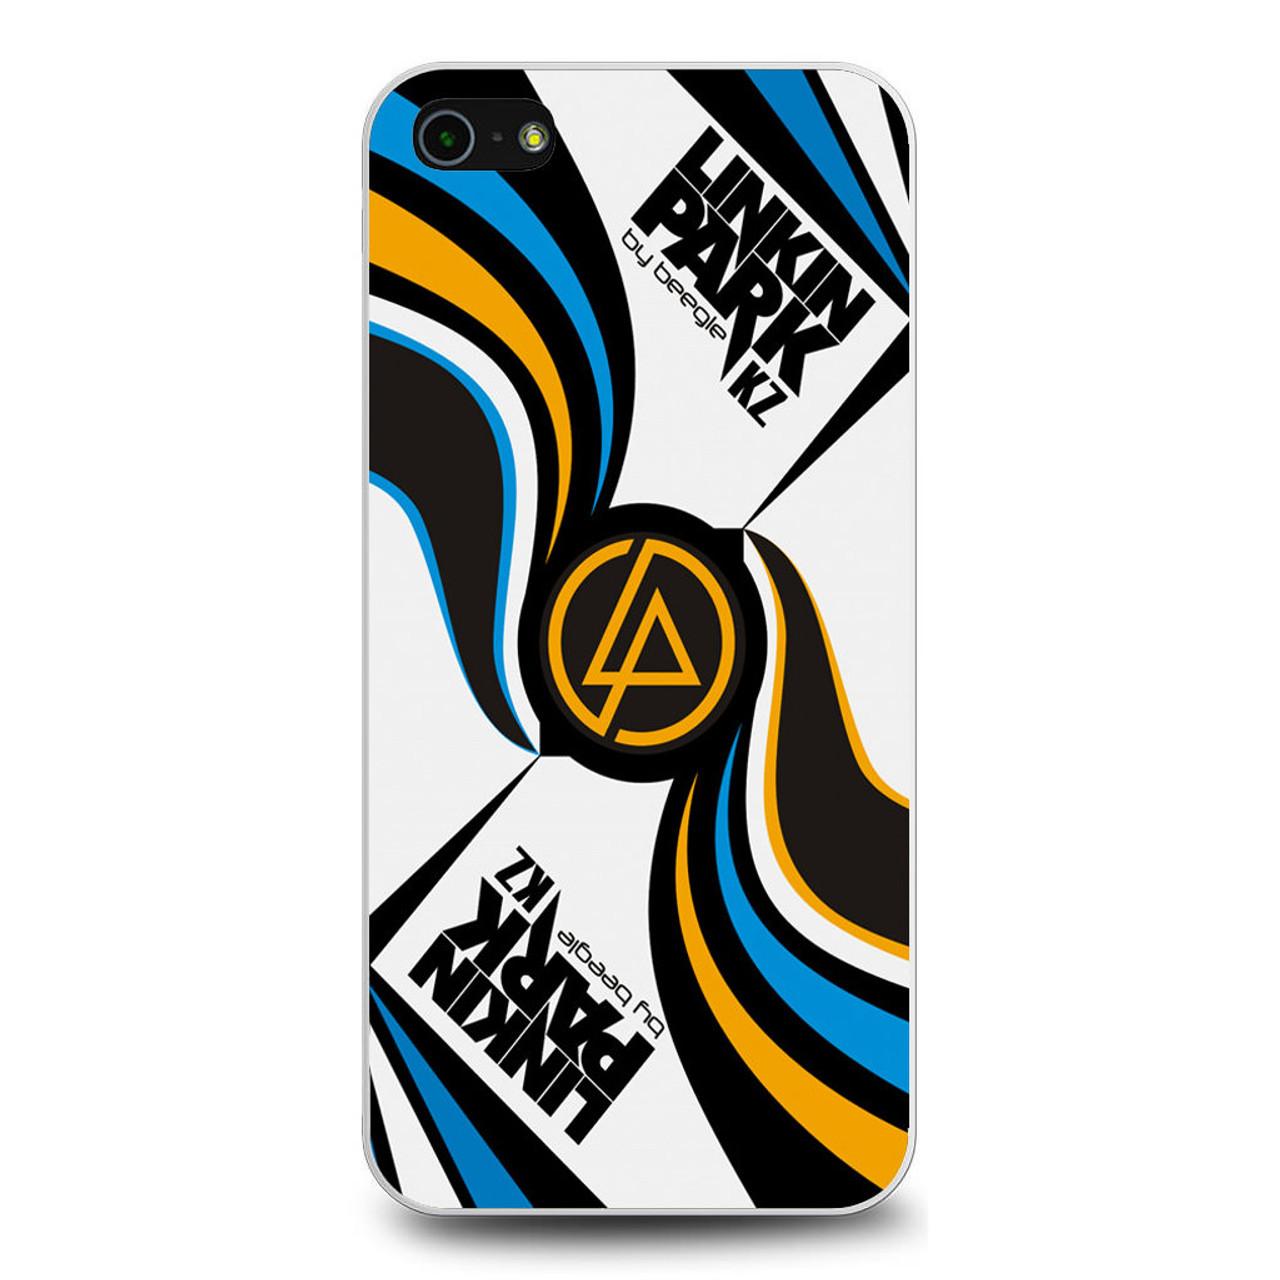 Linkin Park Art iPhone 5/5S/SE Case